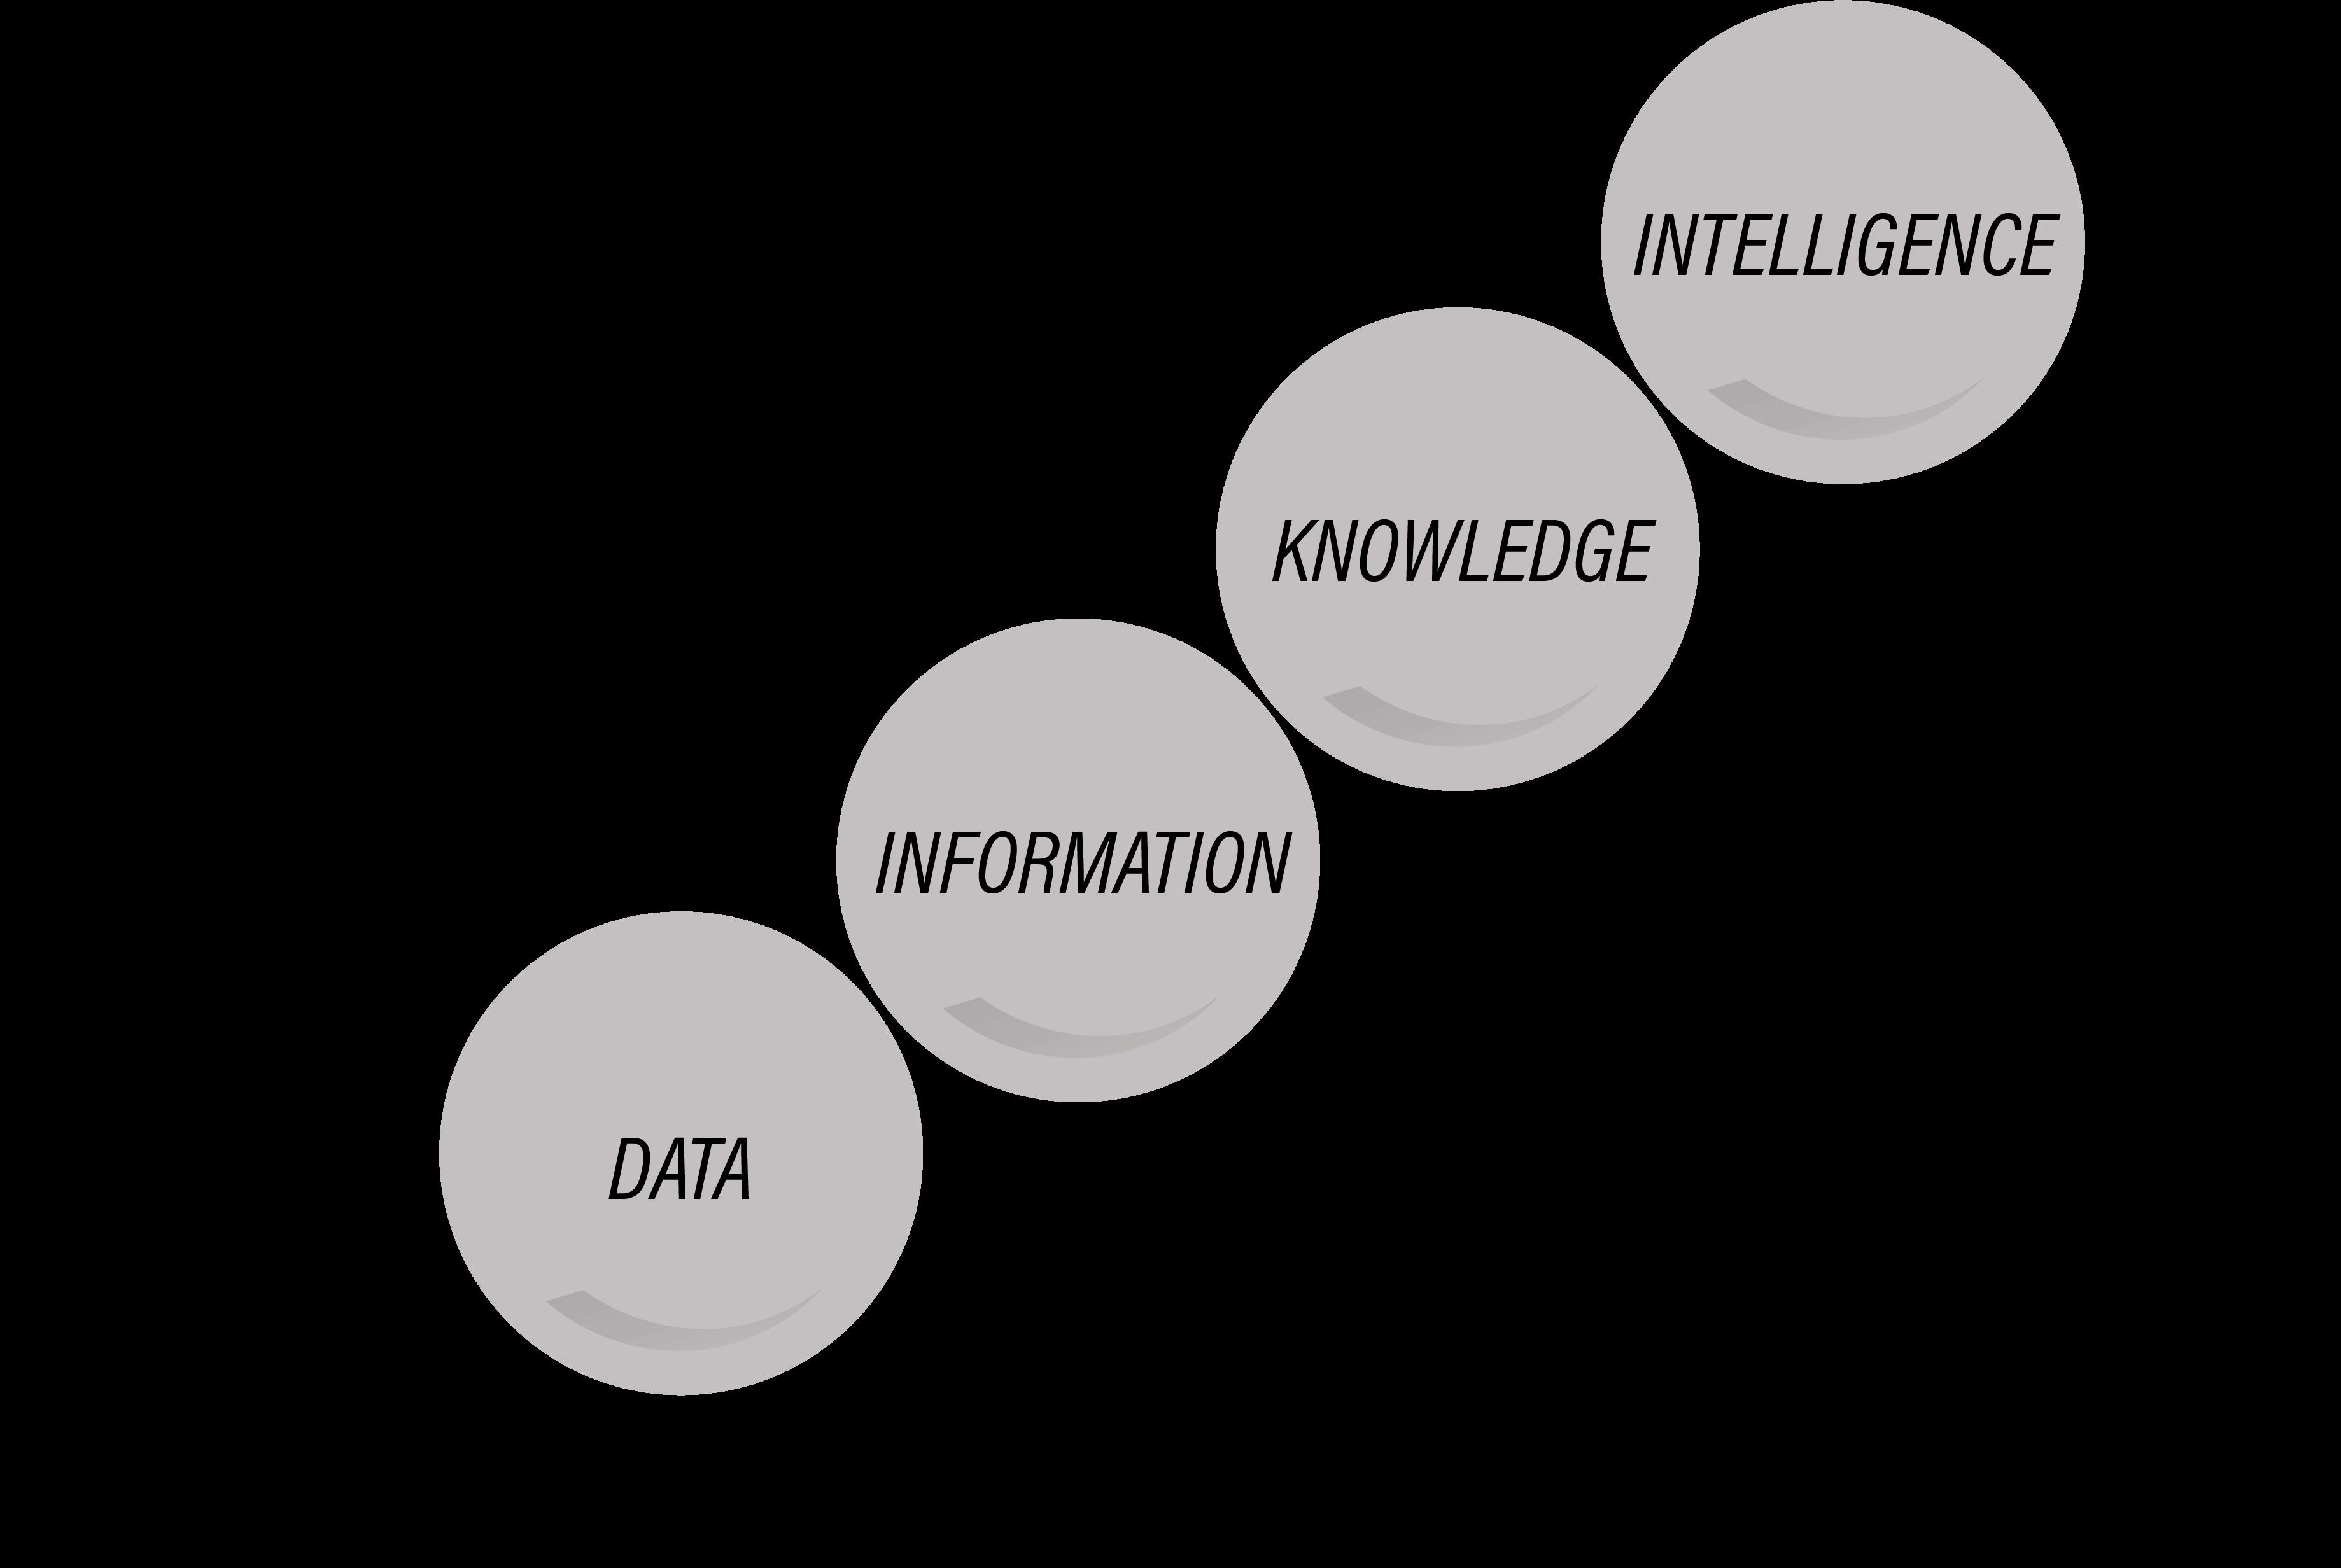 graph showing understanding vs context